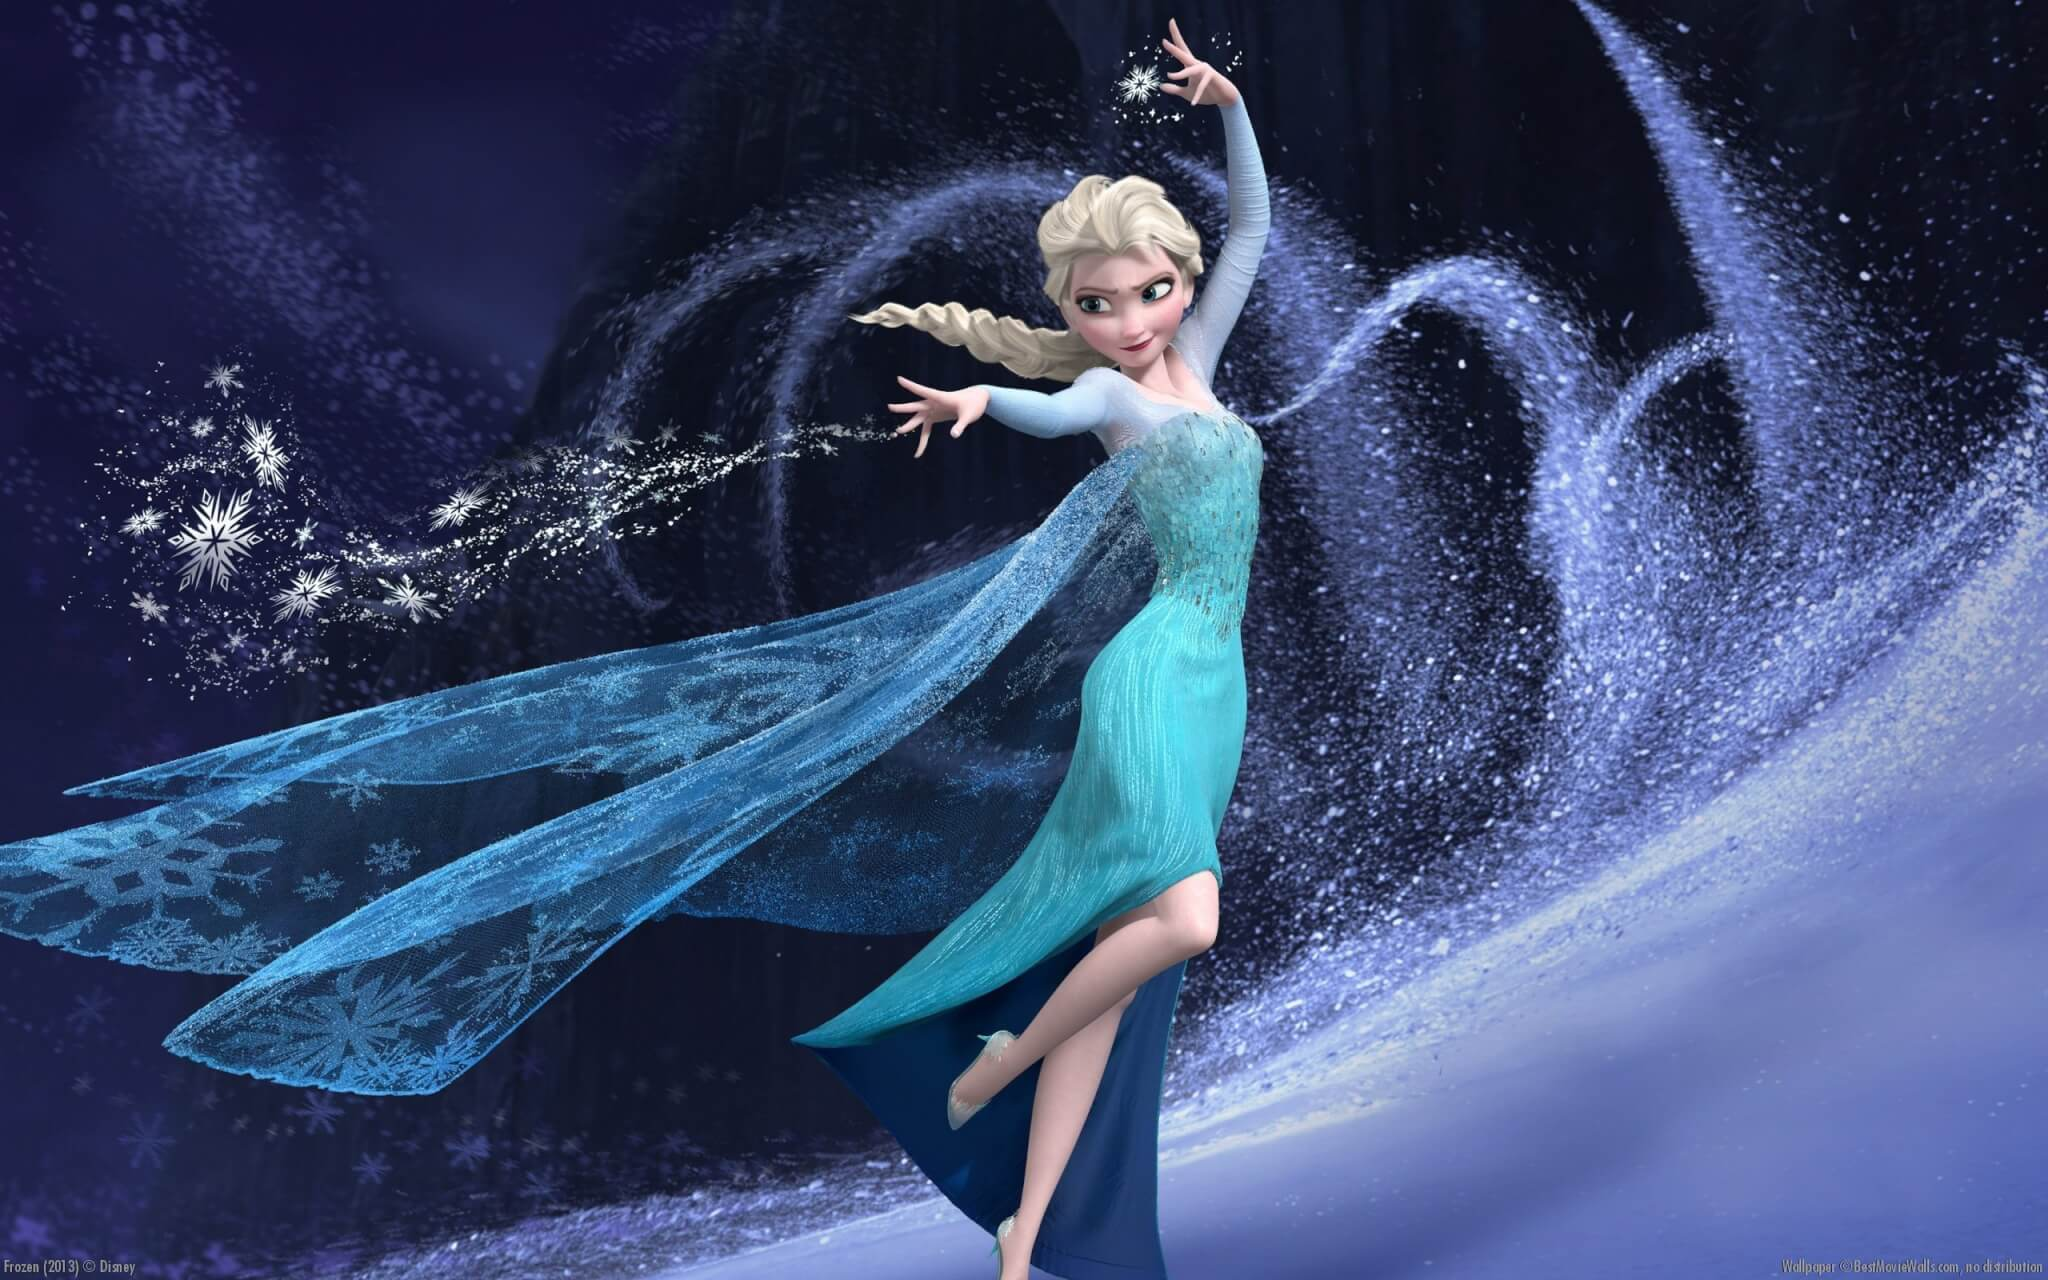 frozen image frozen 36065977 2560 1600 - Frozen bate Fifa 15 e CoD como produto de entretenimento mais vendido no Reino Unido em 2014